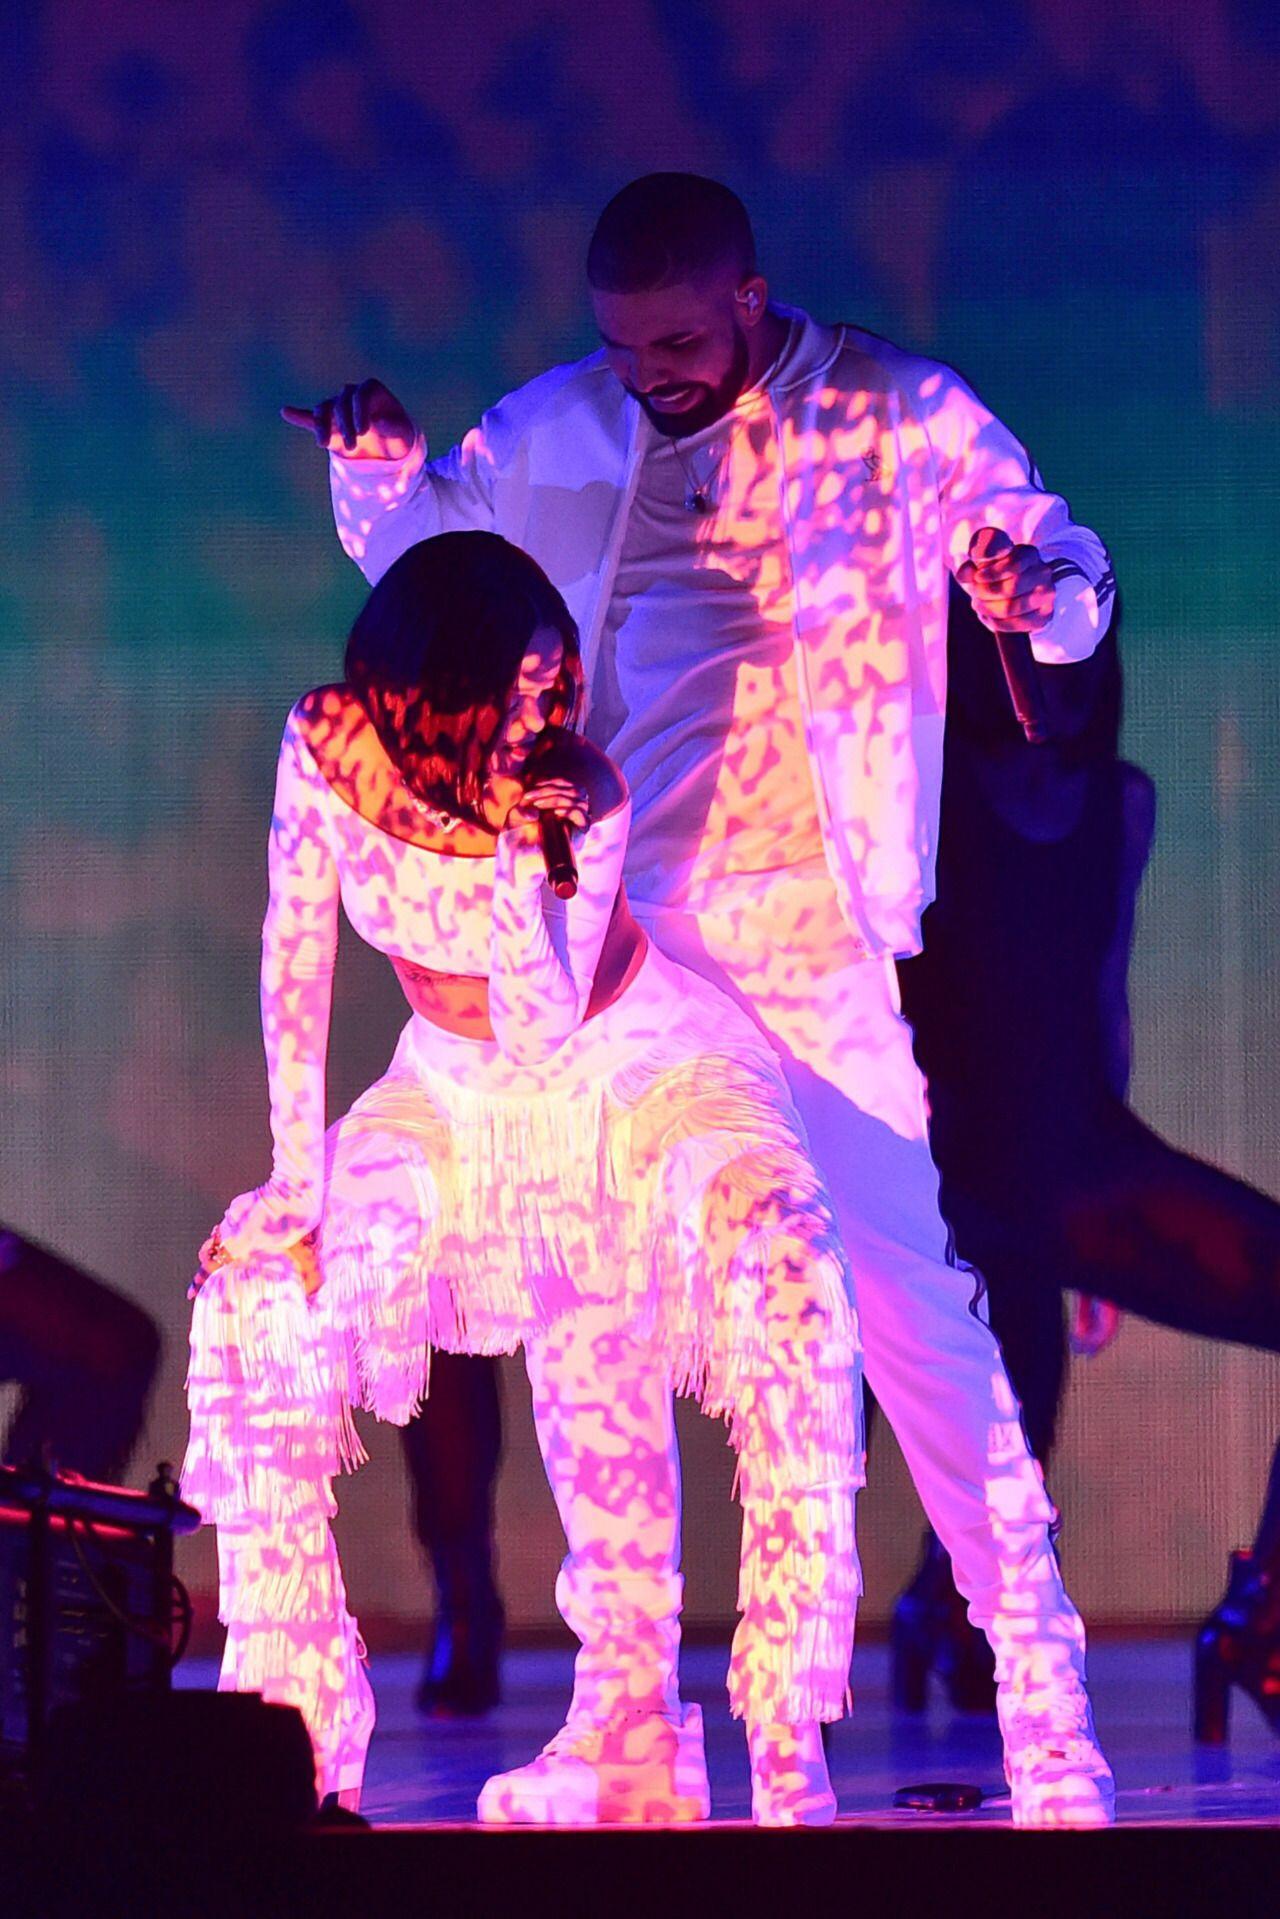 Rihanna Drake dating 2014